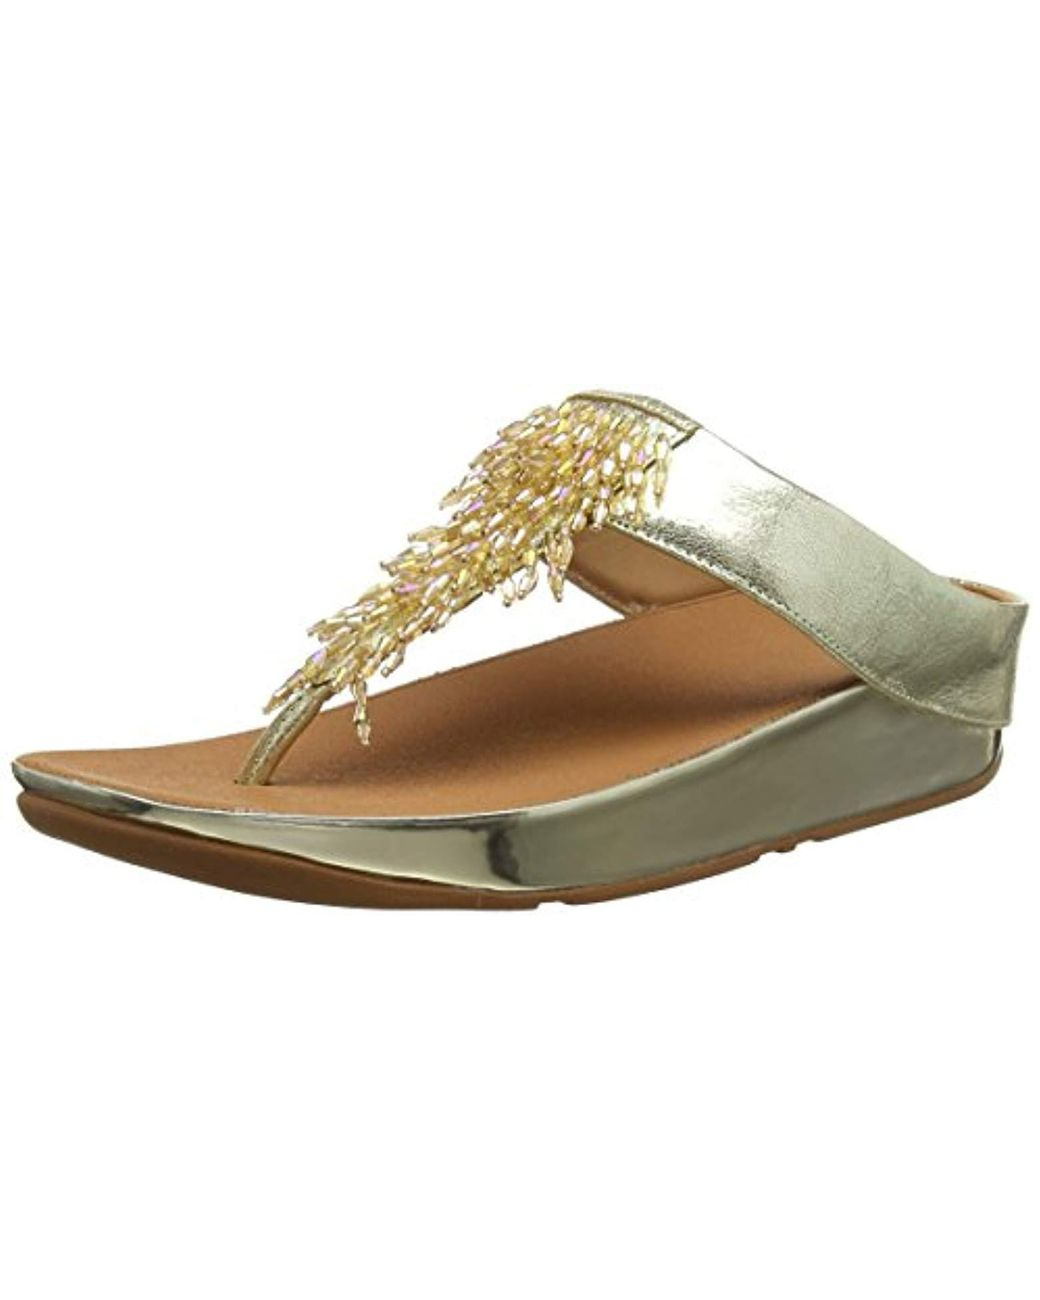 5fe0df22f Fitflop Rumba Toe-thong Sandals Flip-flop in Metallic - Lyst